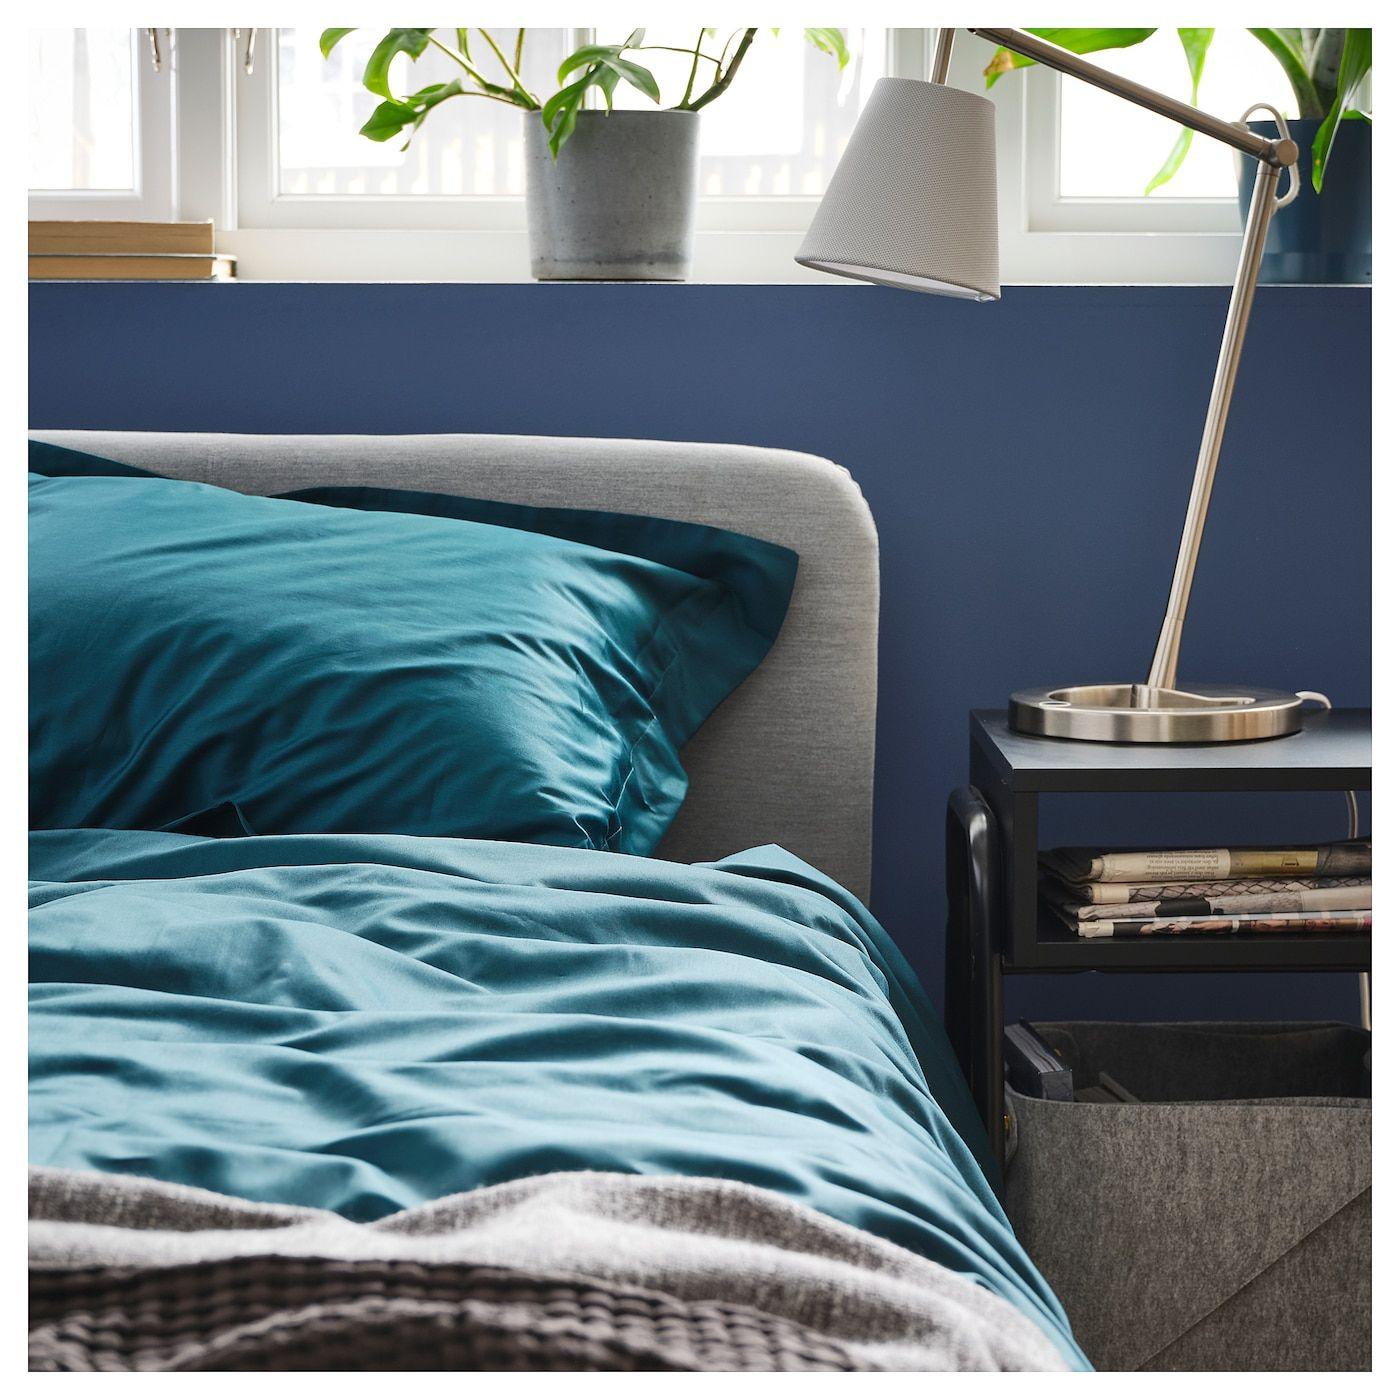 Luktjasmin Duvet Cover And Pillowcase S Dark Green Full Queen